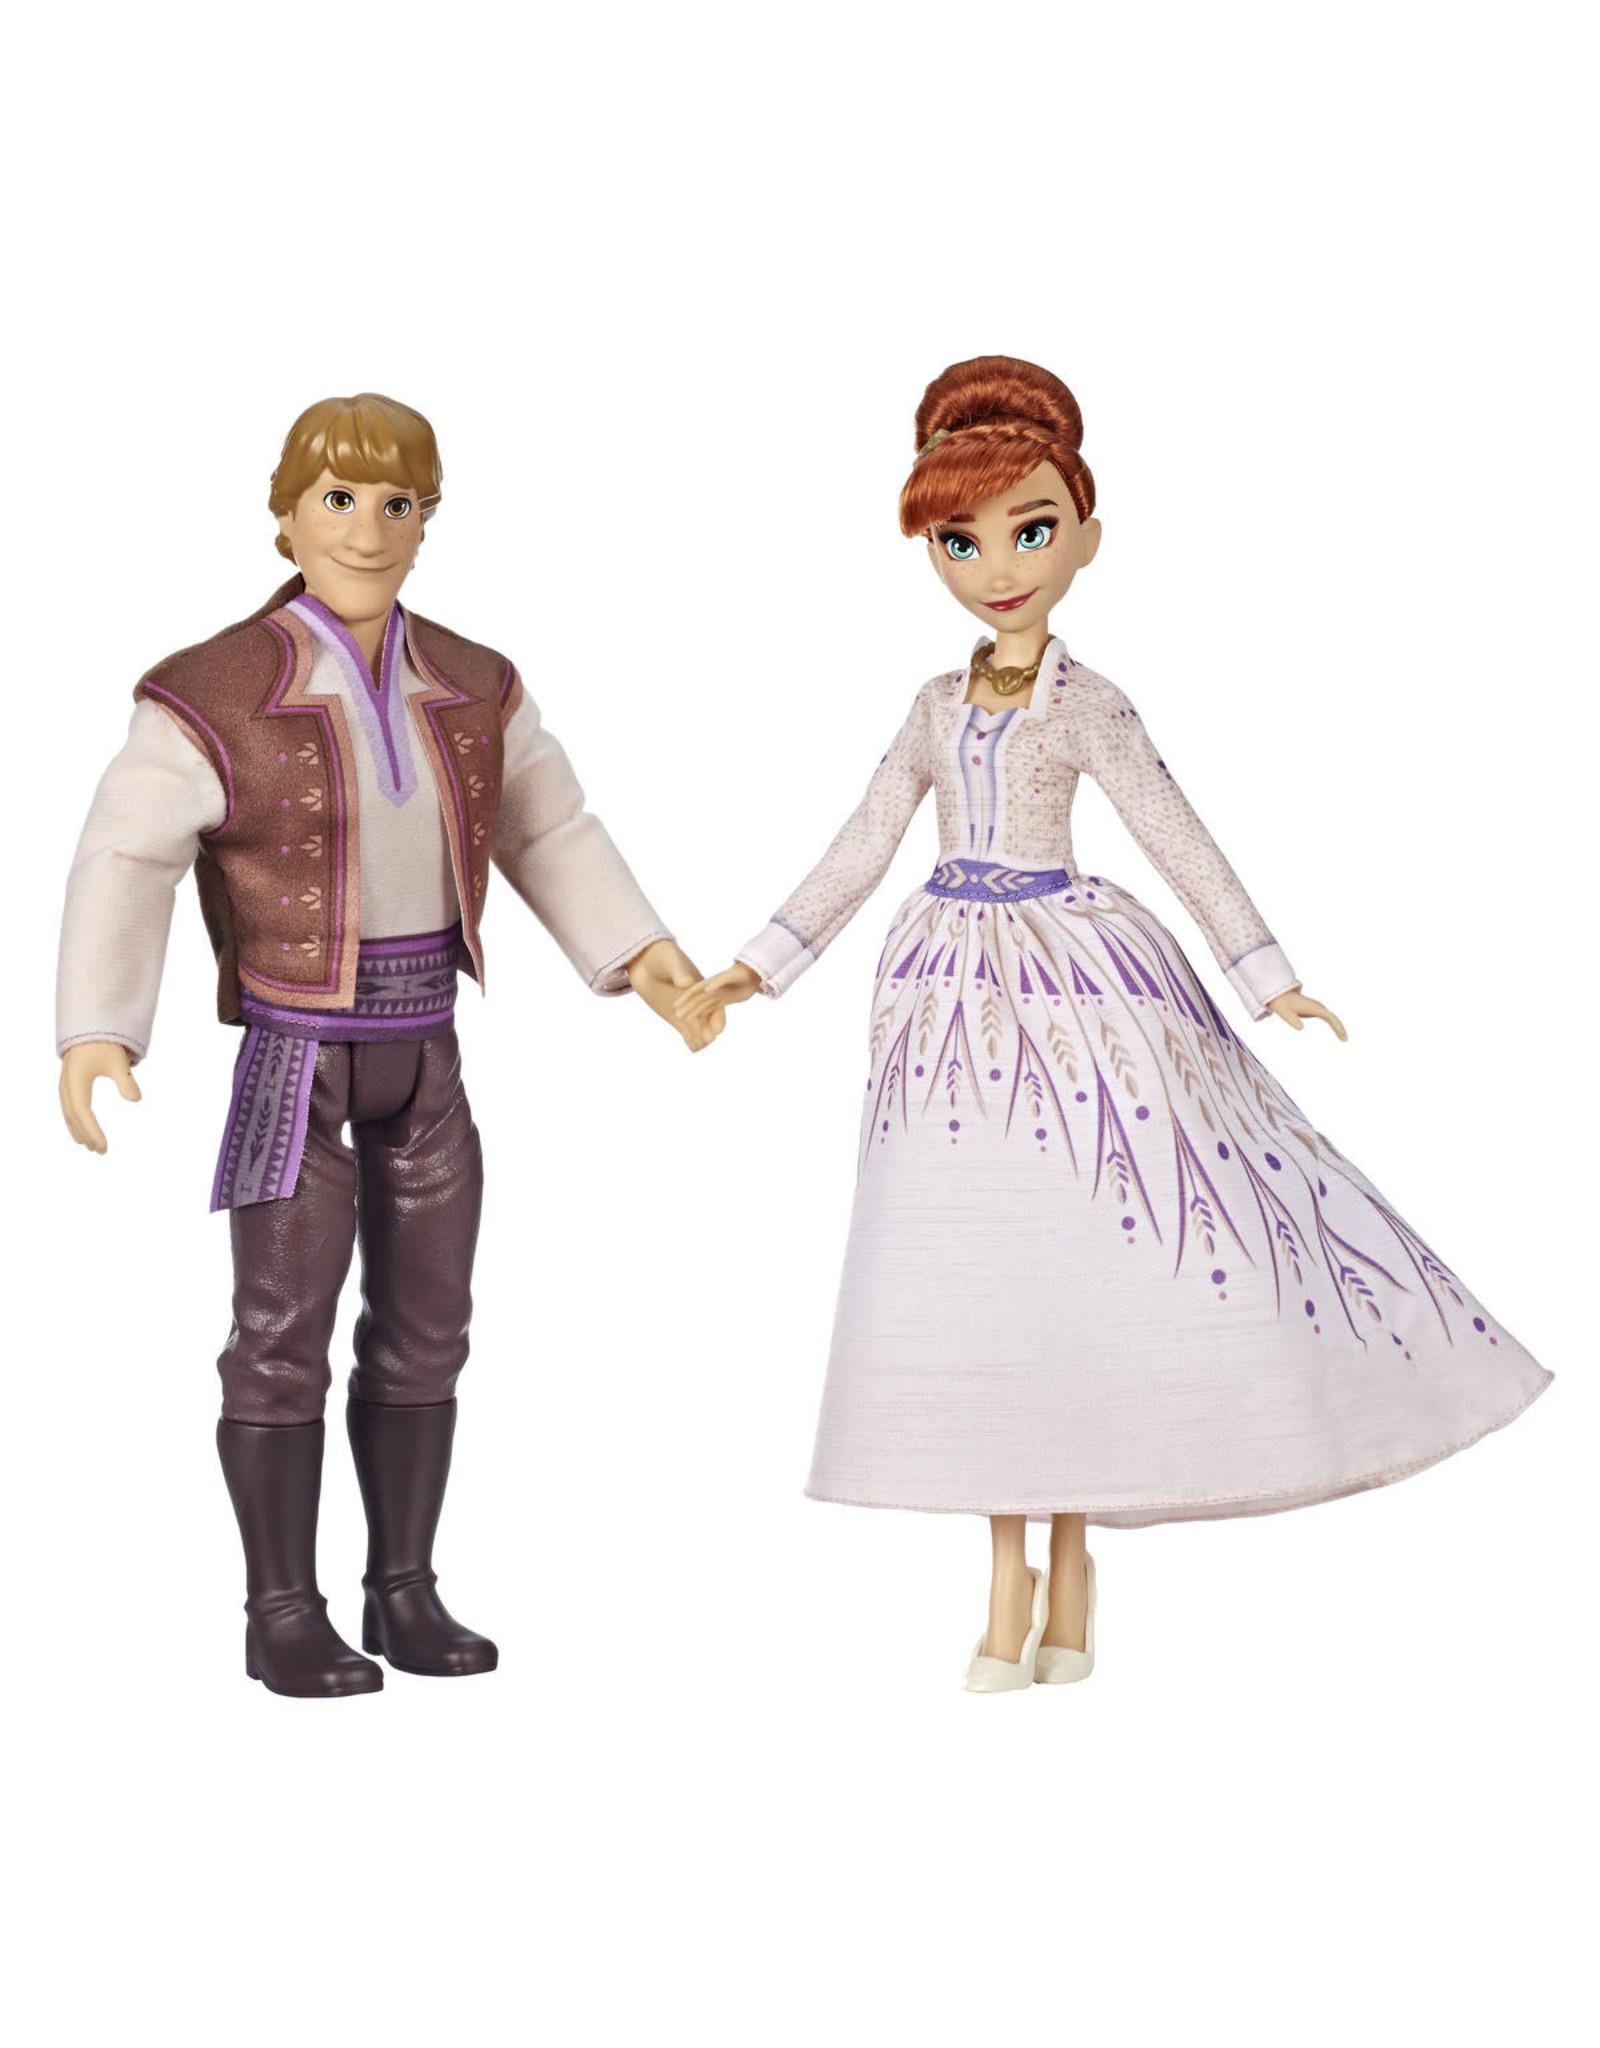 FROZEN 2 ROMANCE SET ANNA & KRISTOFF